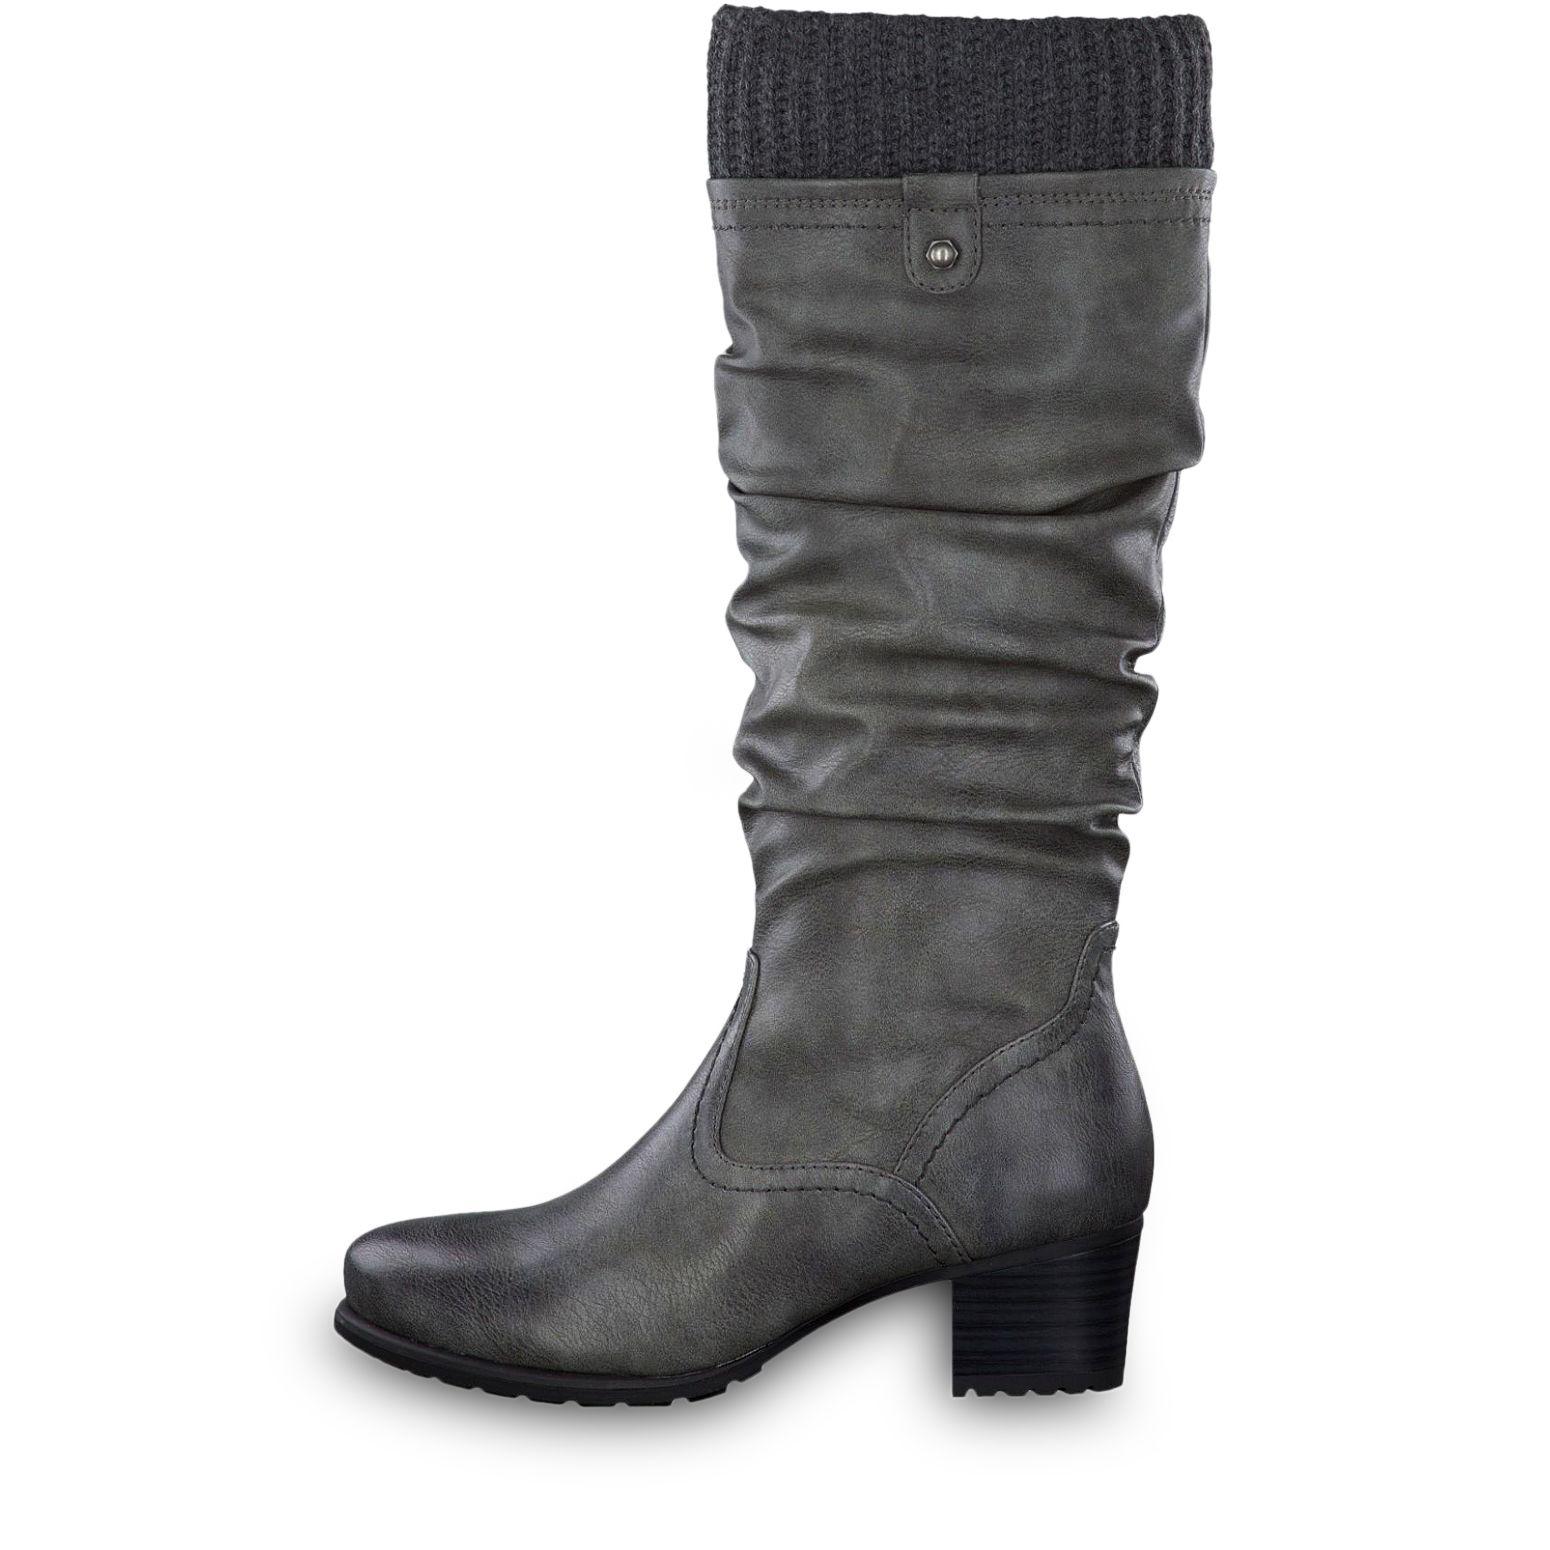 8b16341c4afd0e Paddy 1-1-26627-29  Buy Tamaris Boots online!